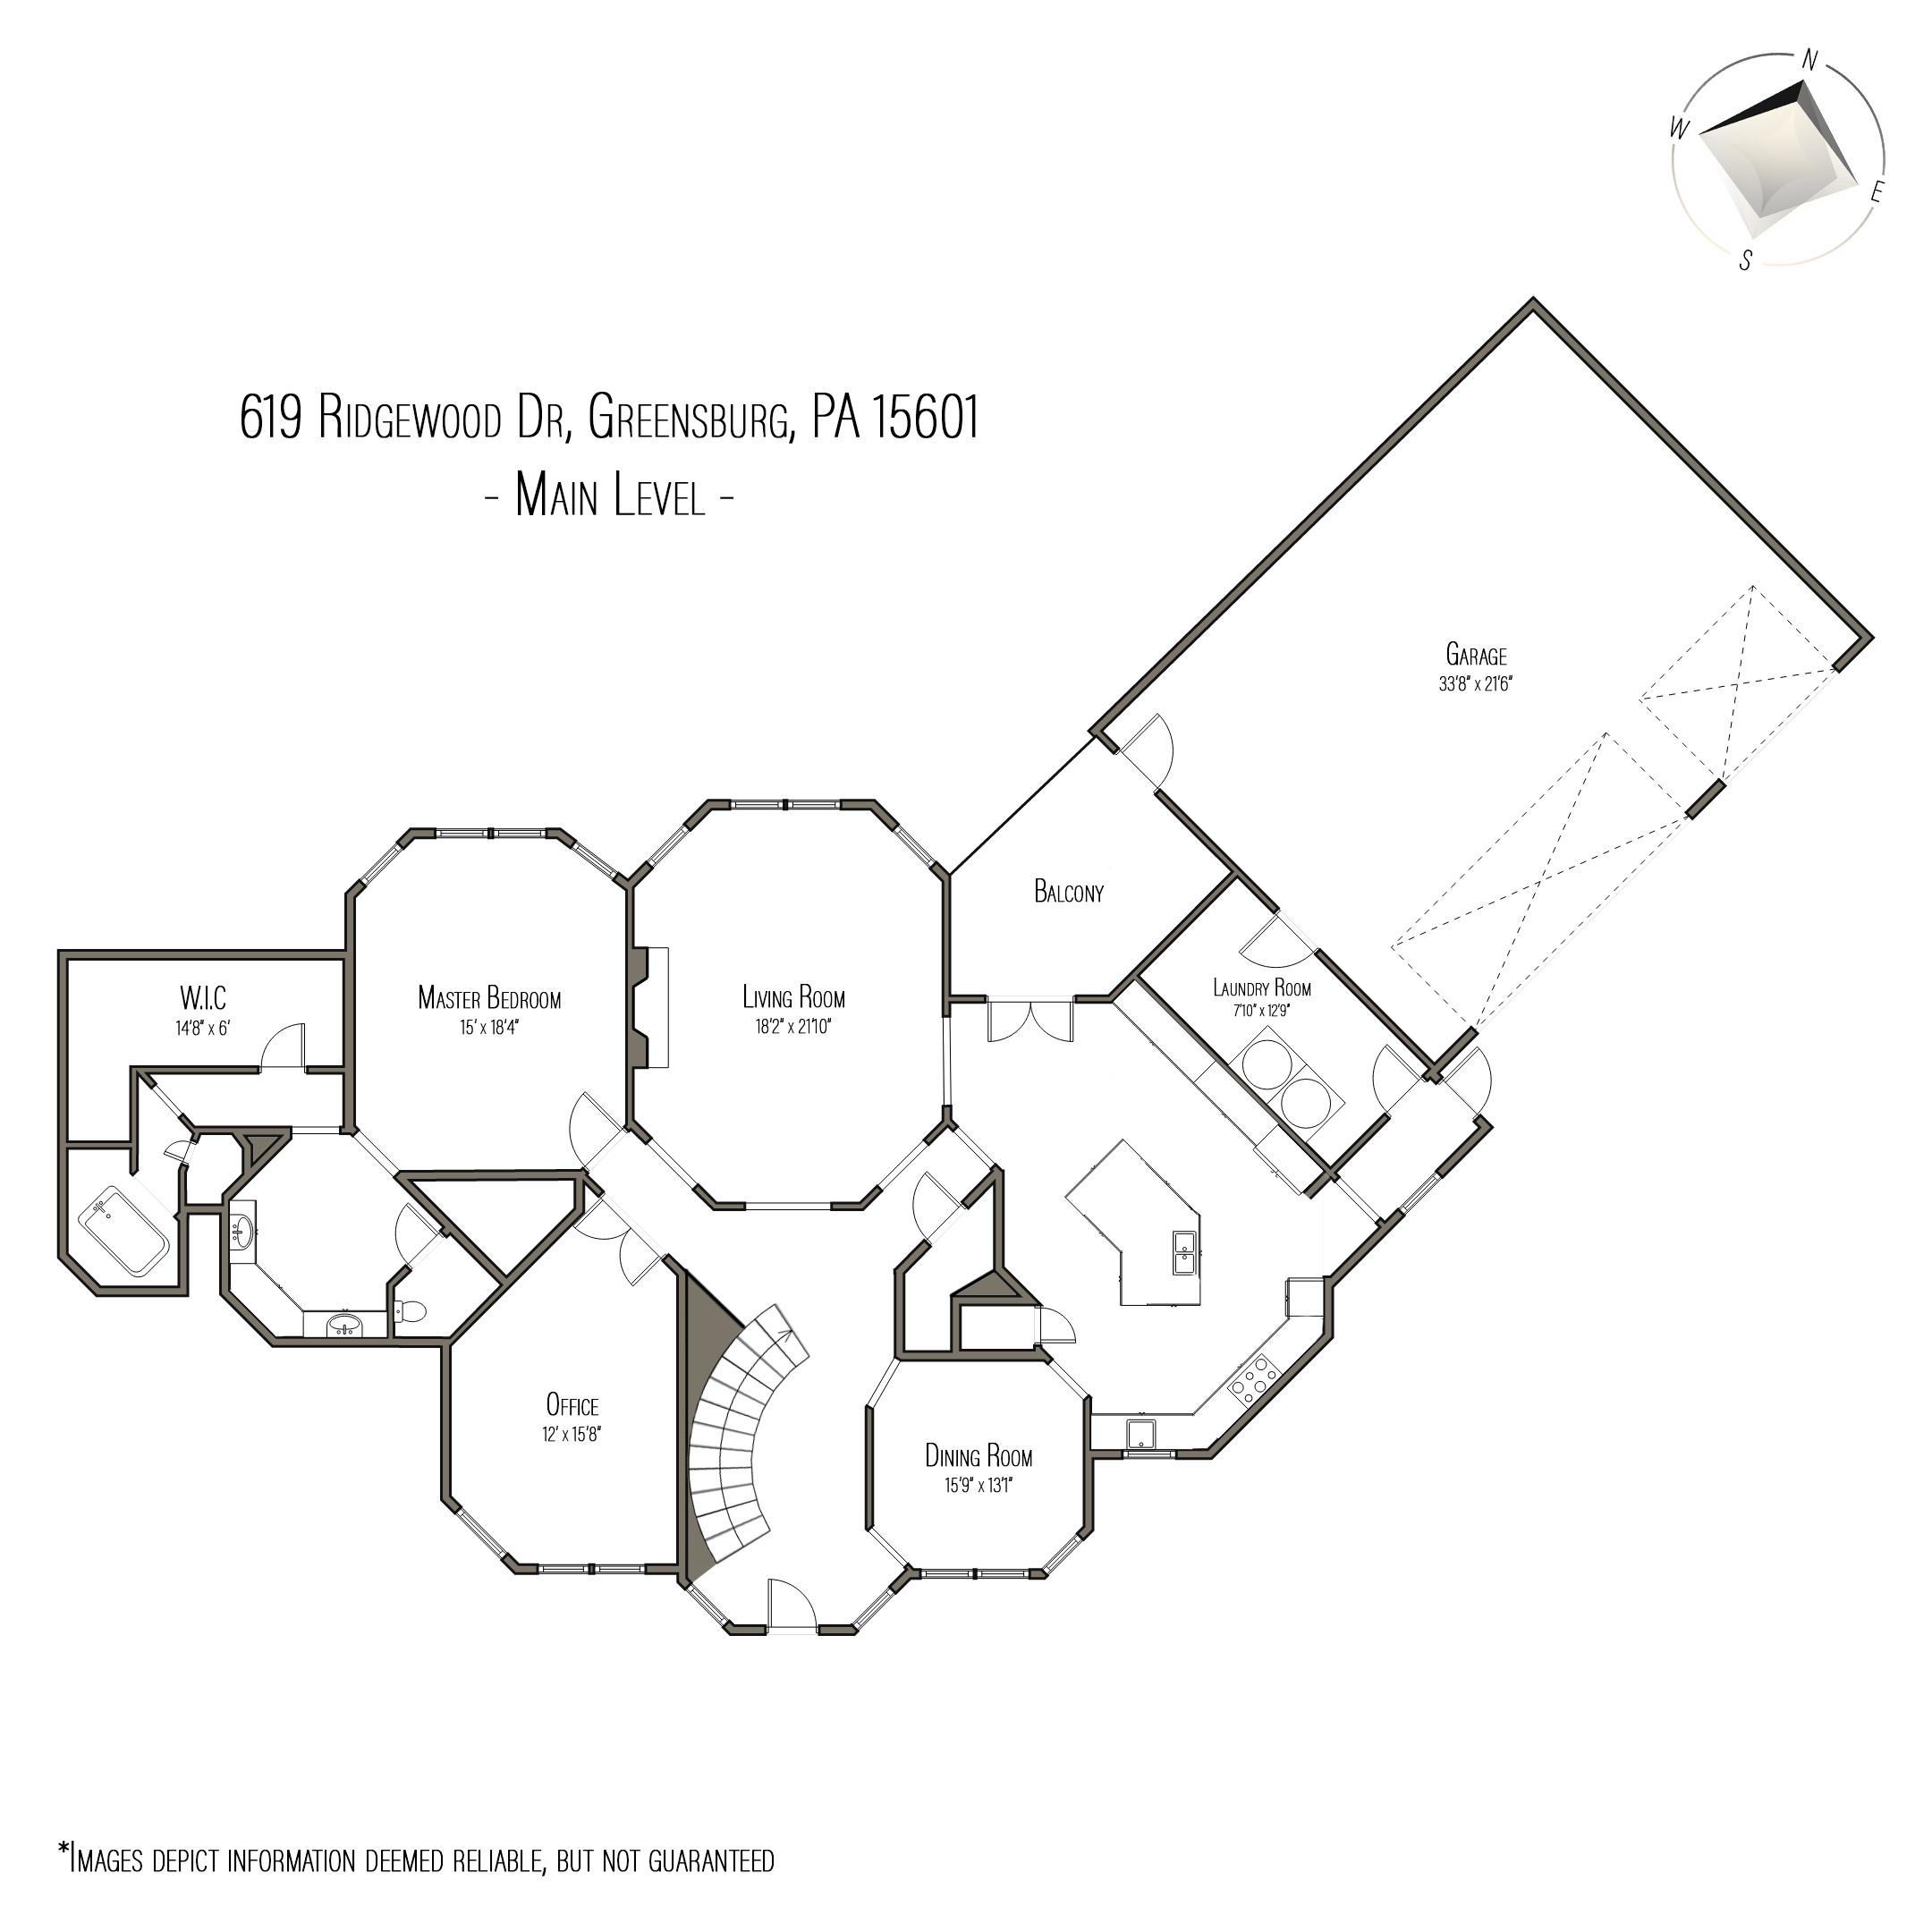 Kitchen Gallery Greensburg Pa: 619 Ridgewood Dr, Greensburg, PA 15601